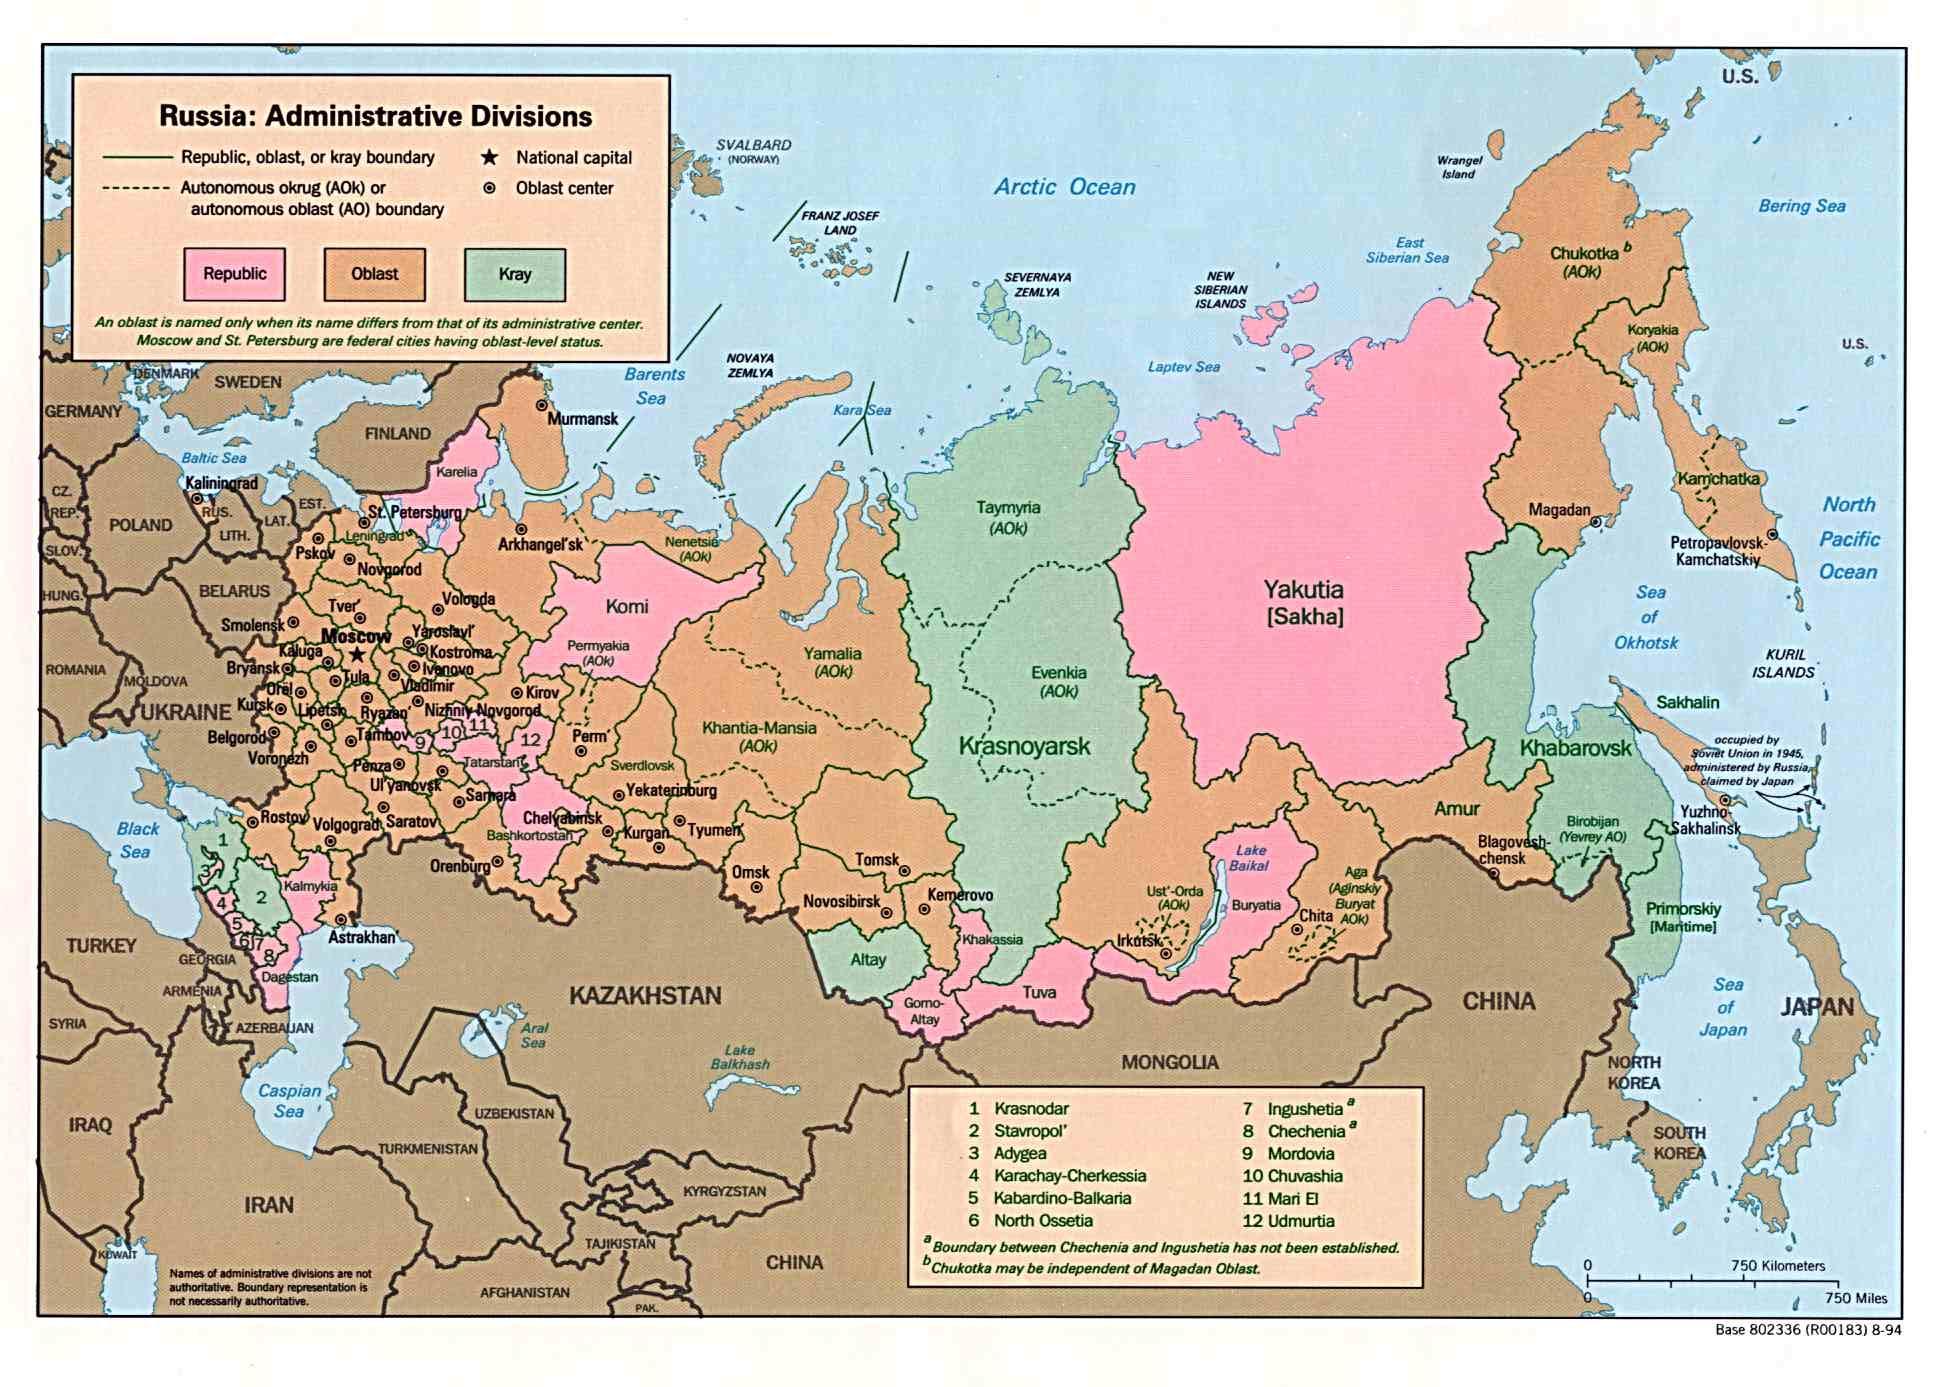 Karte Russland.Landkarte Russland Administrative Bezirke Weltkarte Com